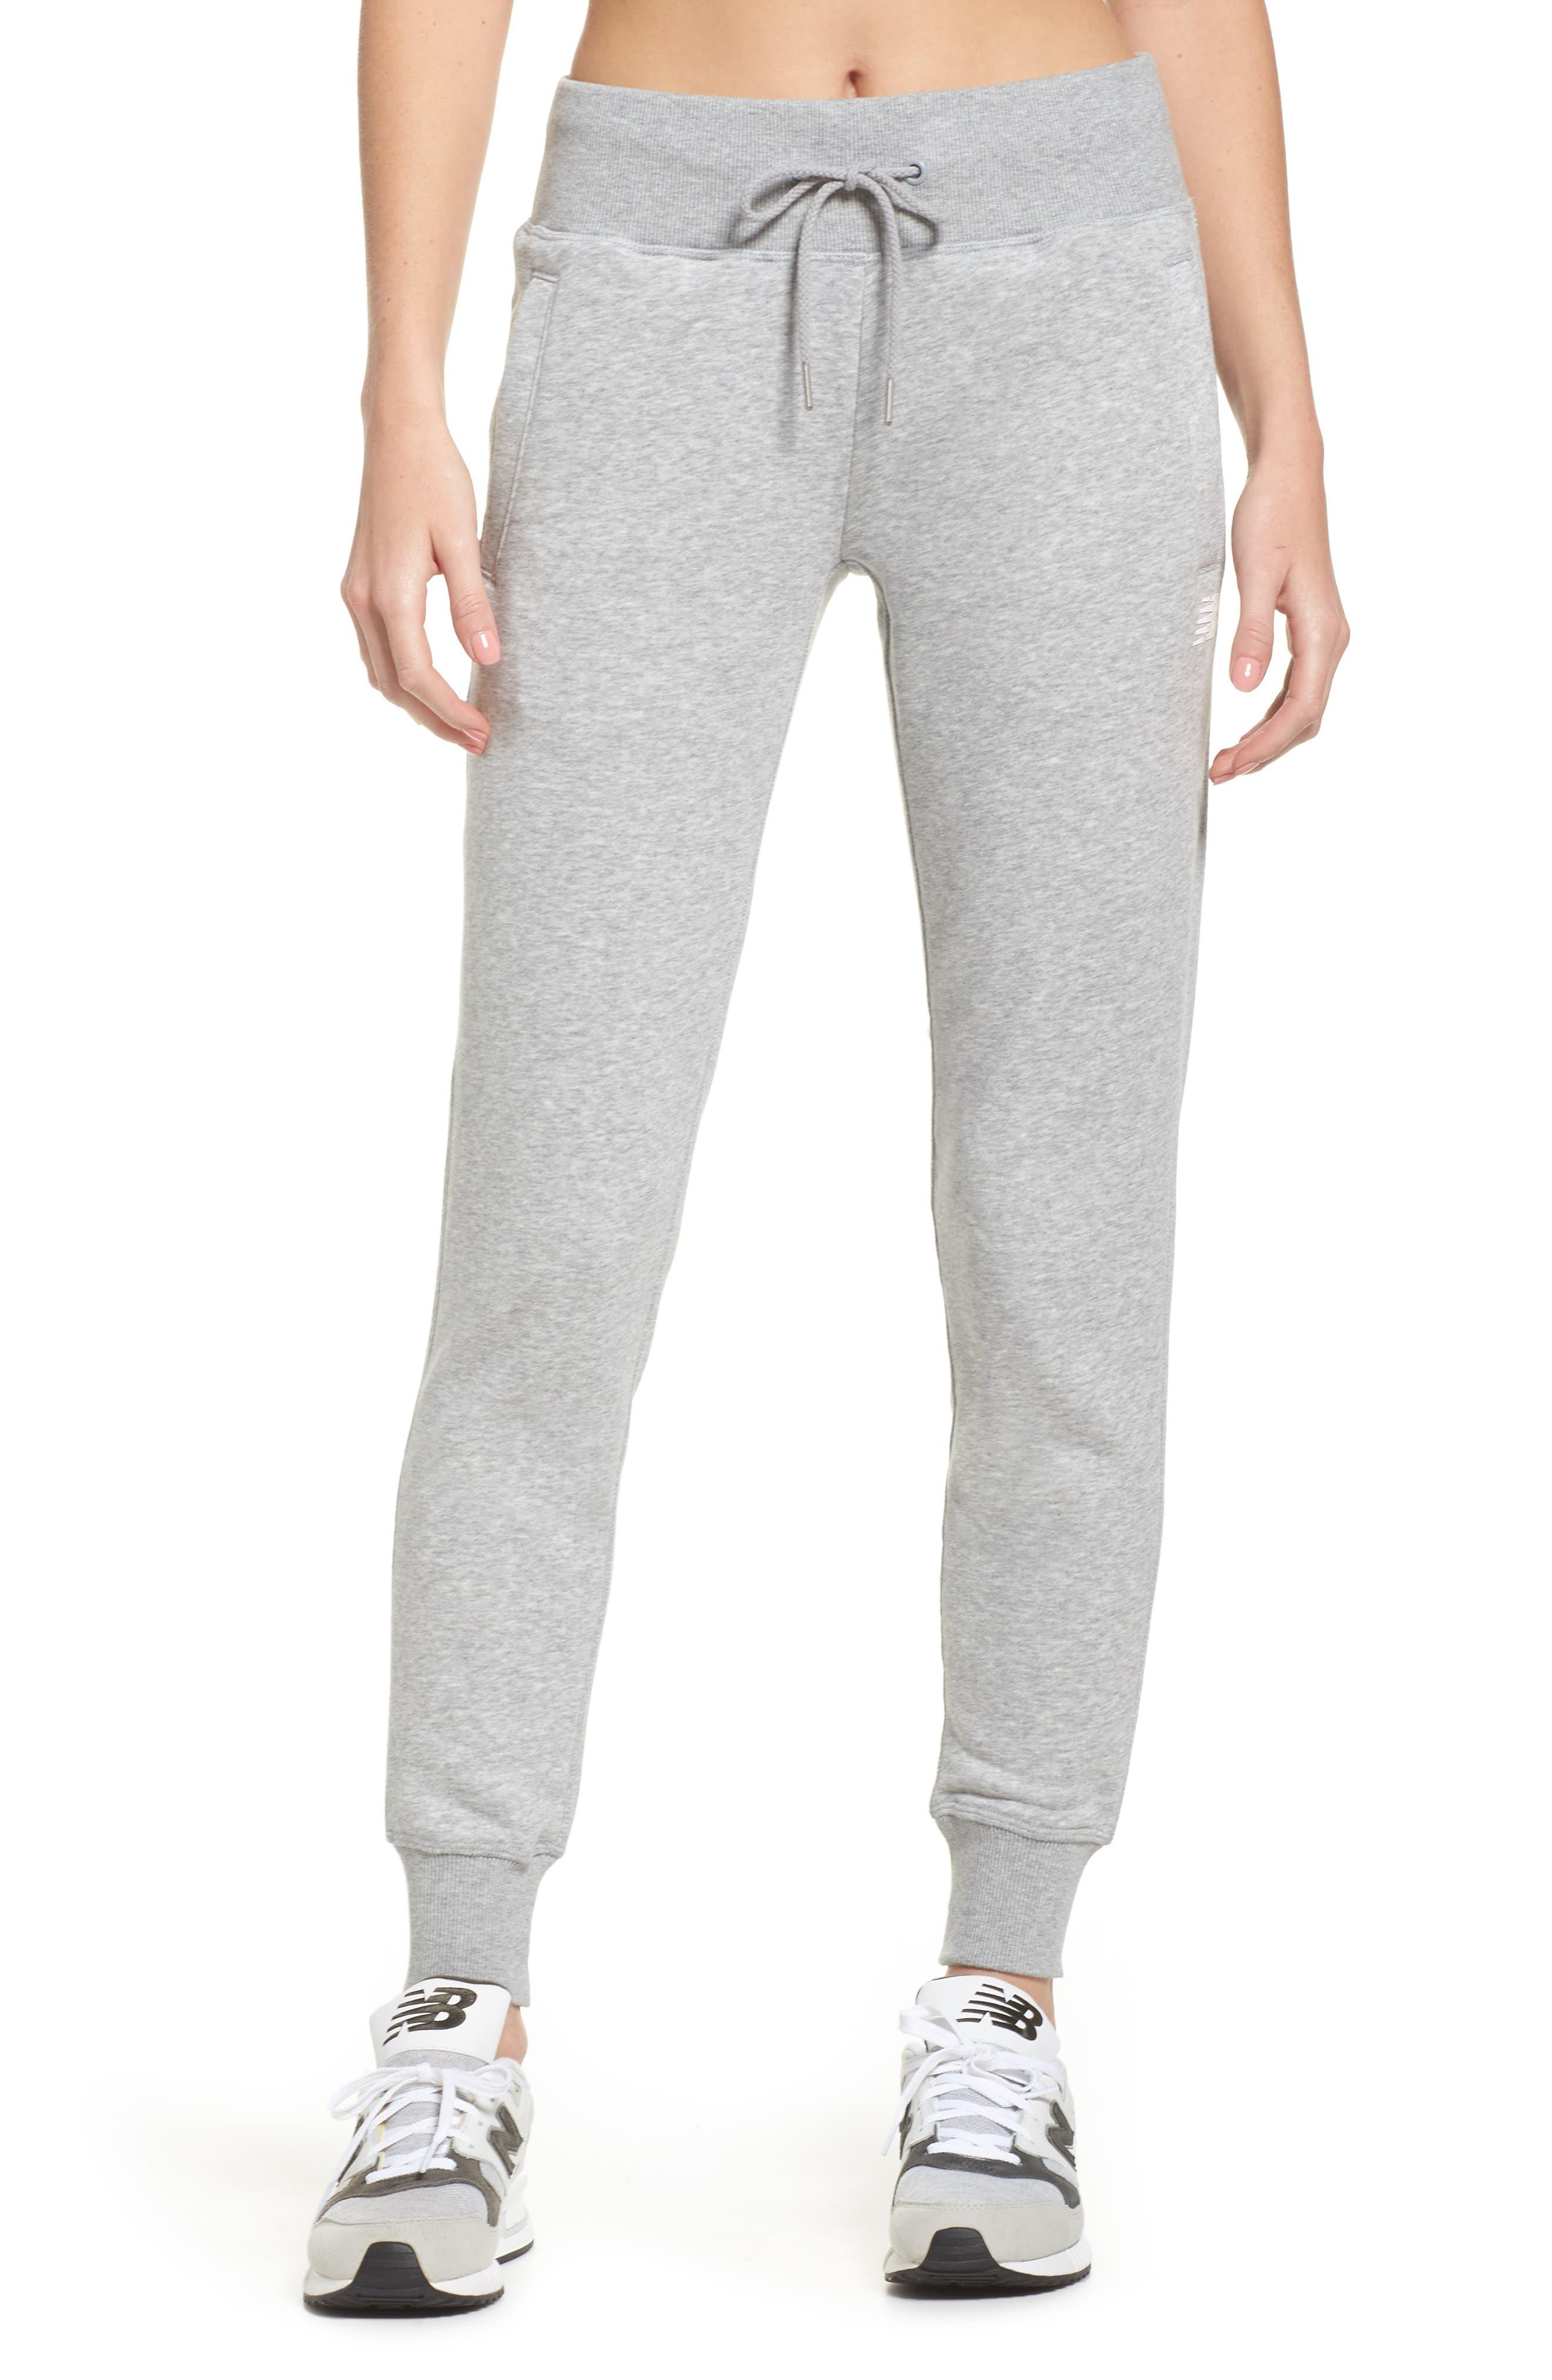 Essentials Sweatpants,                             Main thumbnail 1, color,                             Athletic Grey